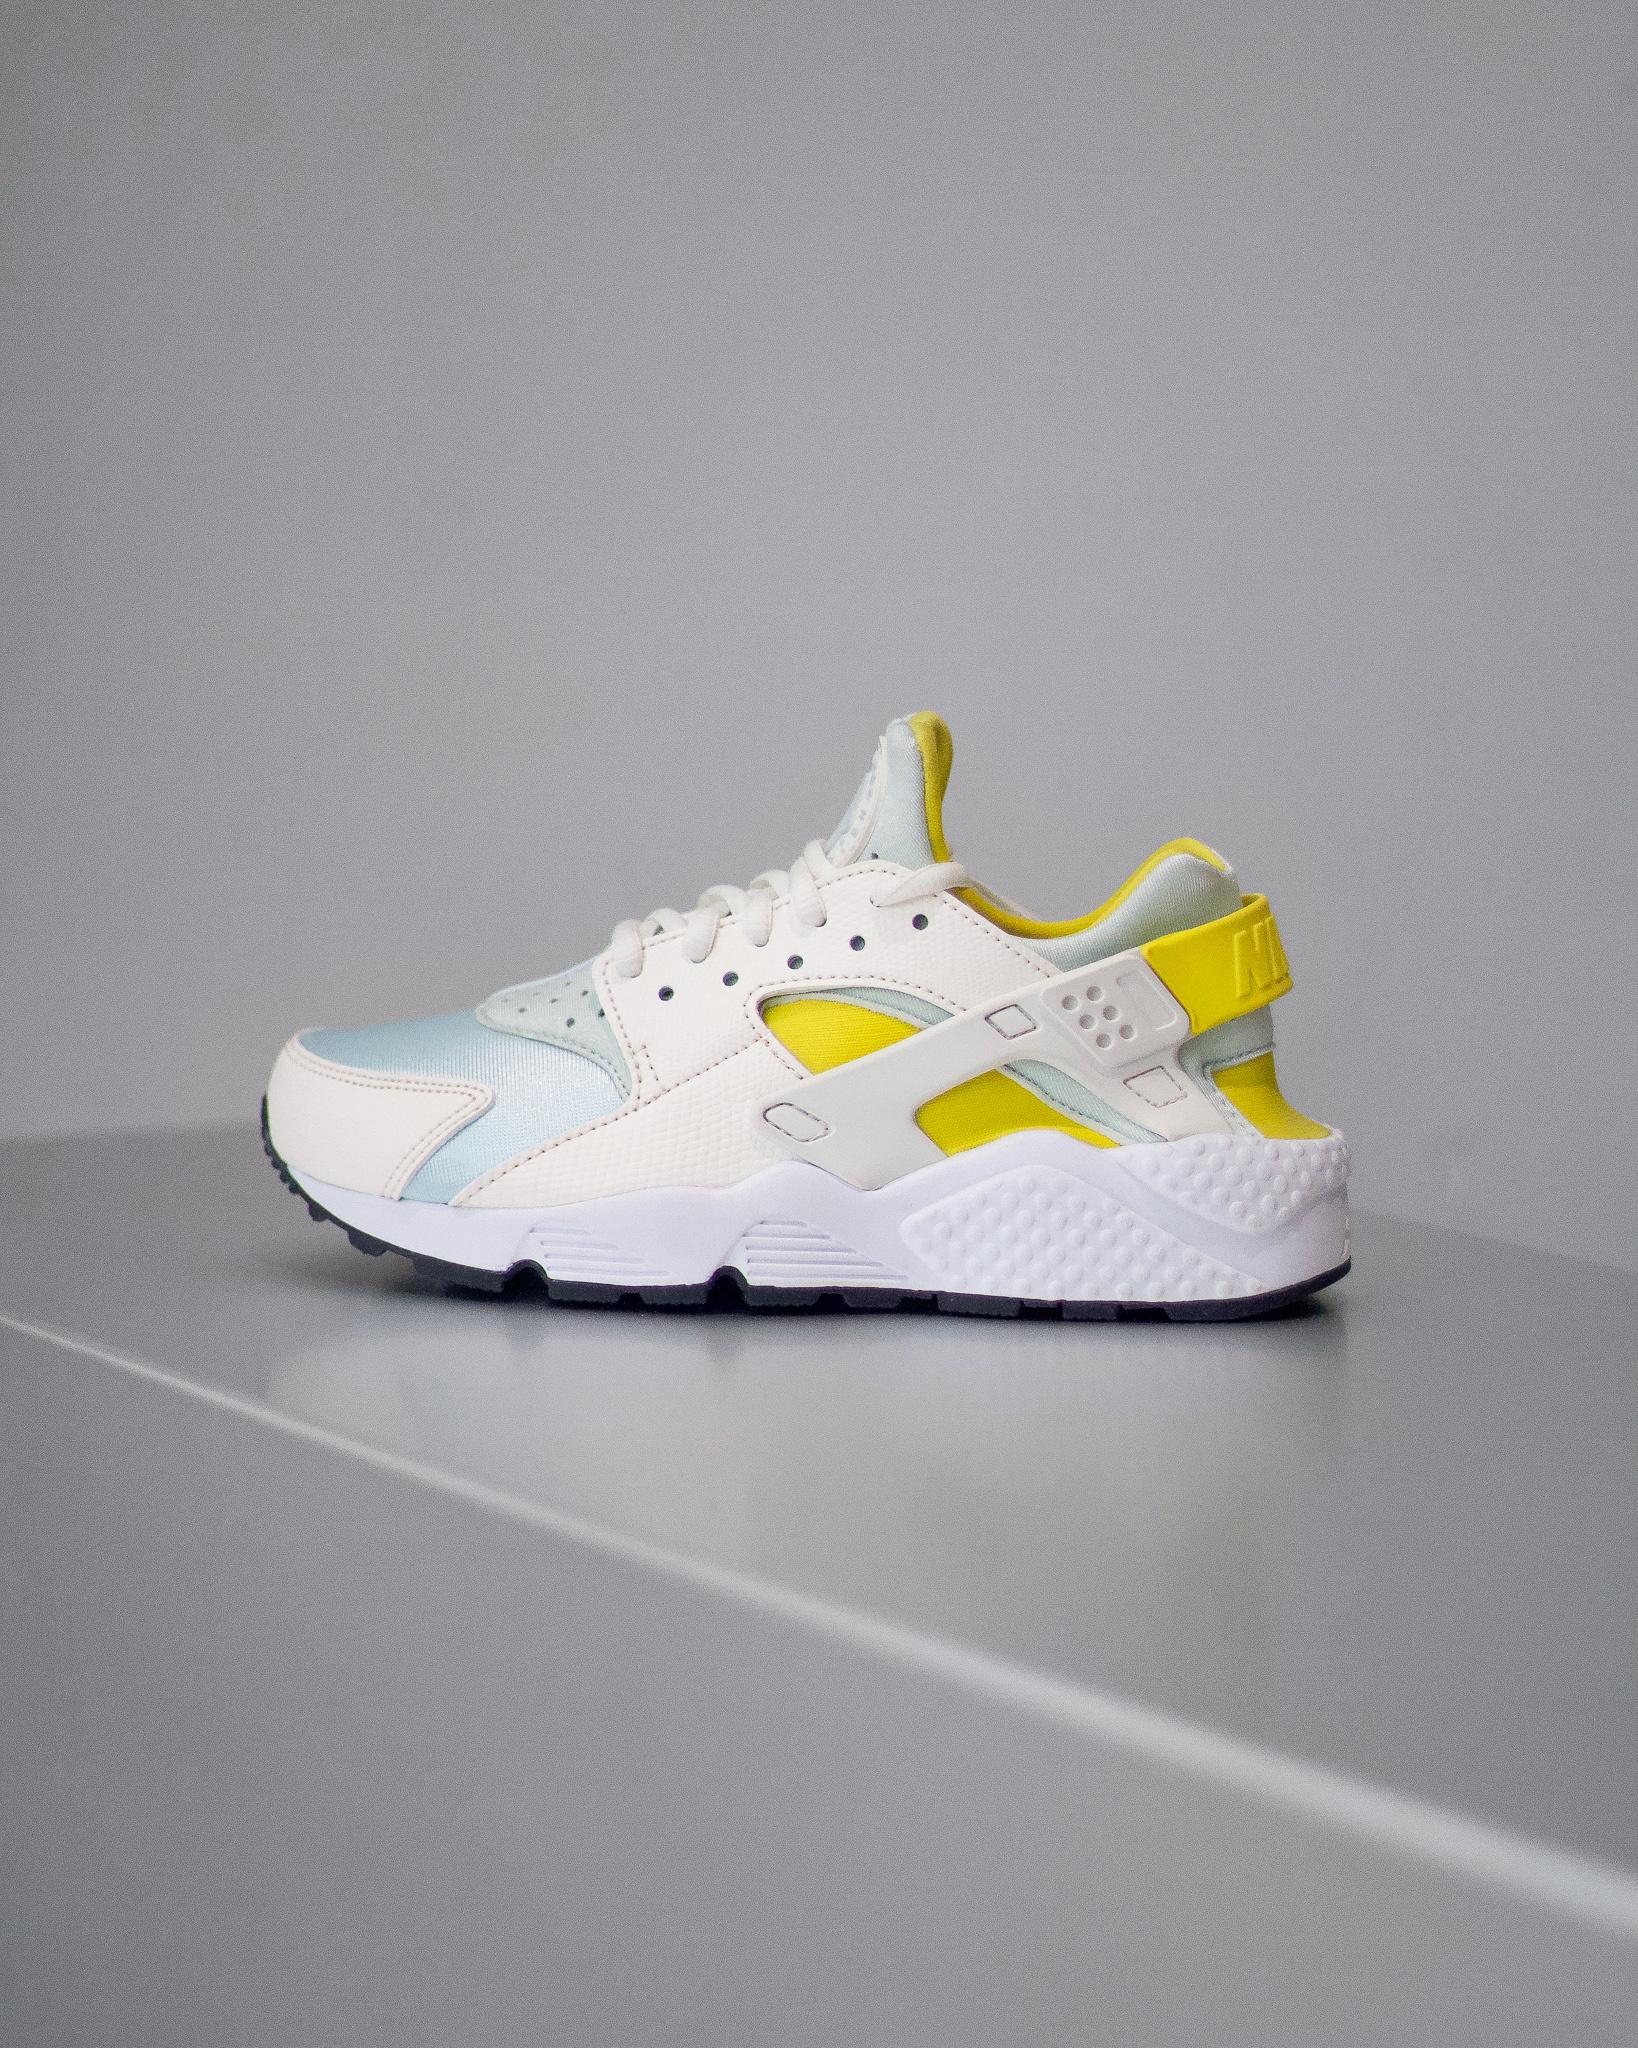 f27a1e2a454f NIKE AIR HUARACHE RUN PRM - Sneaker Room - Jersey City